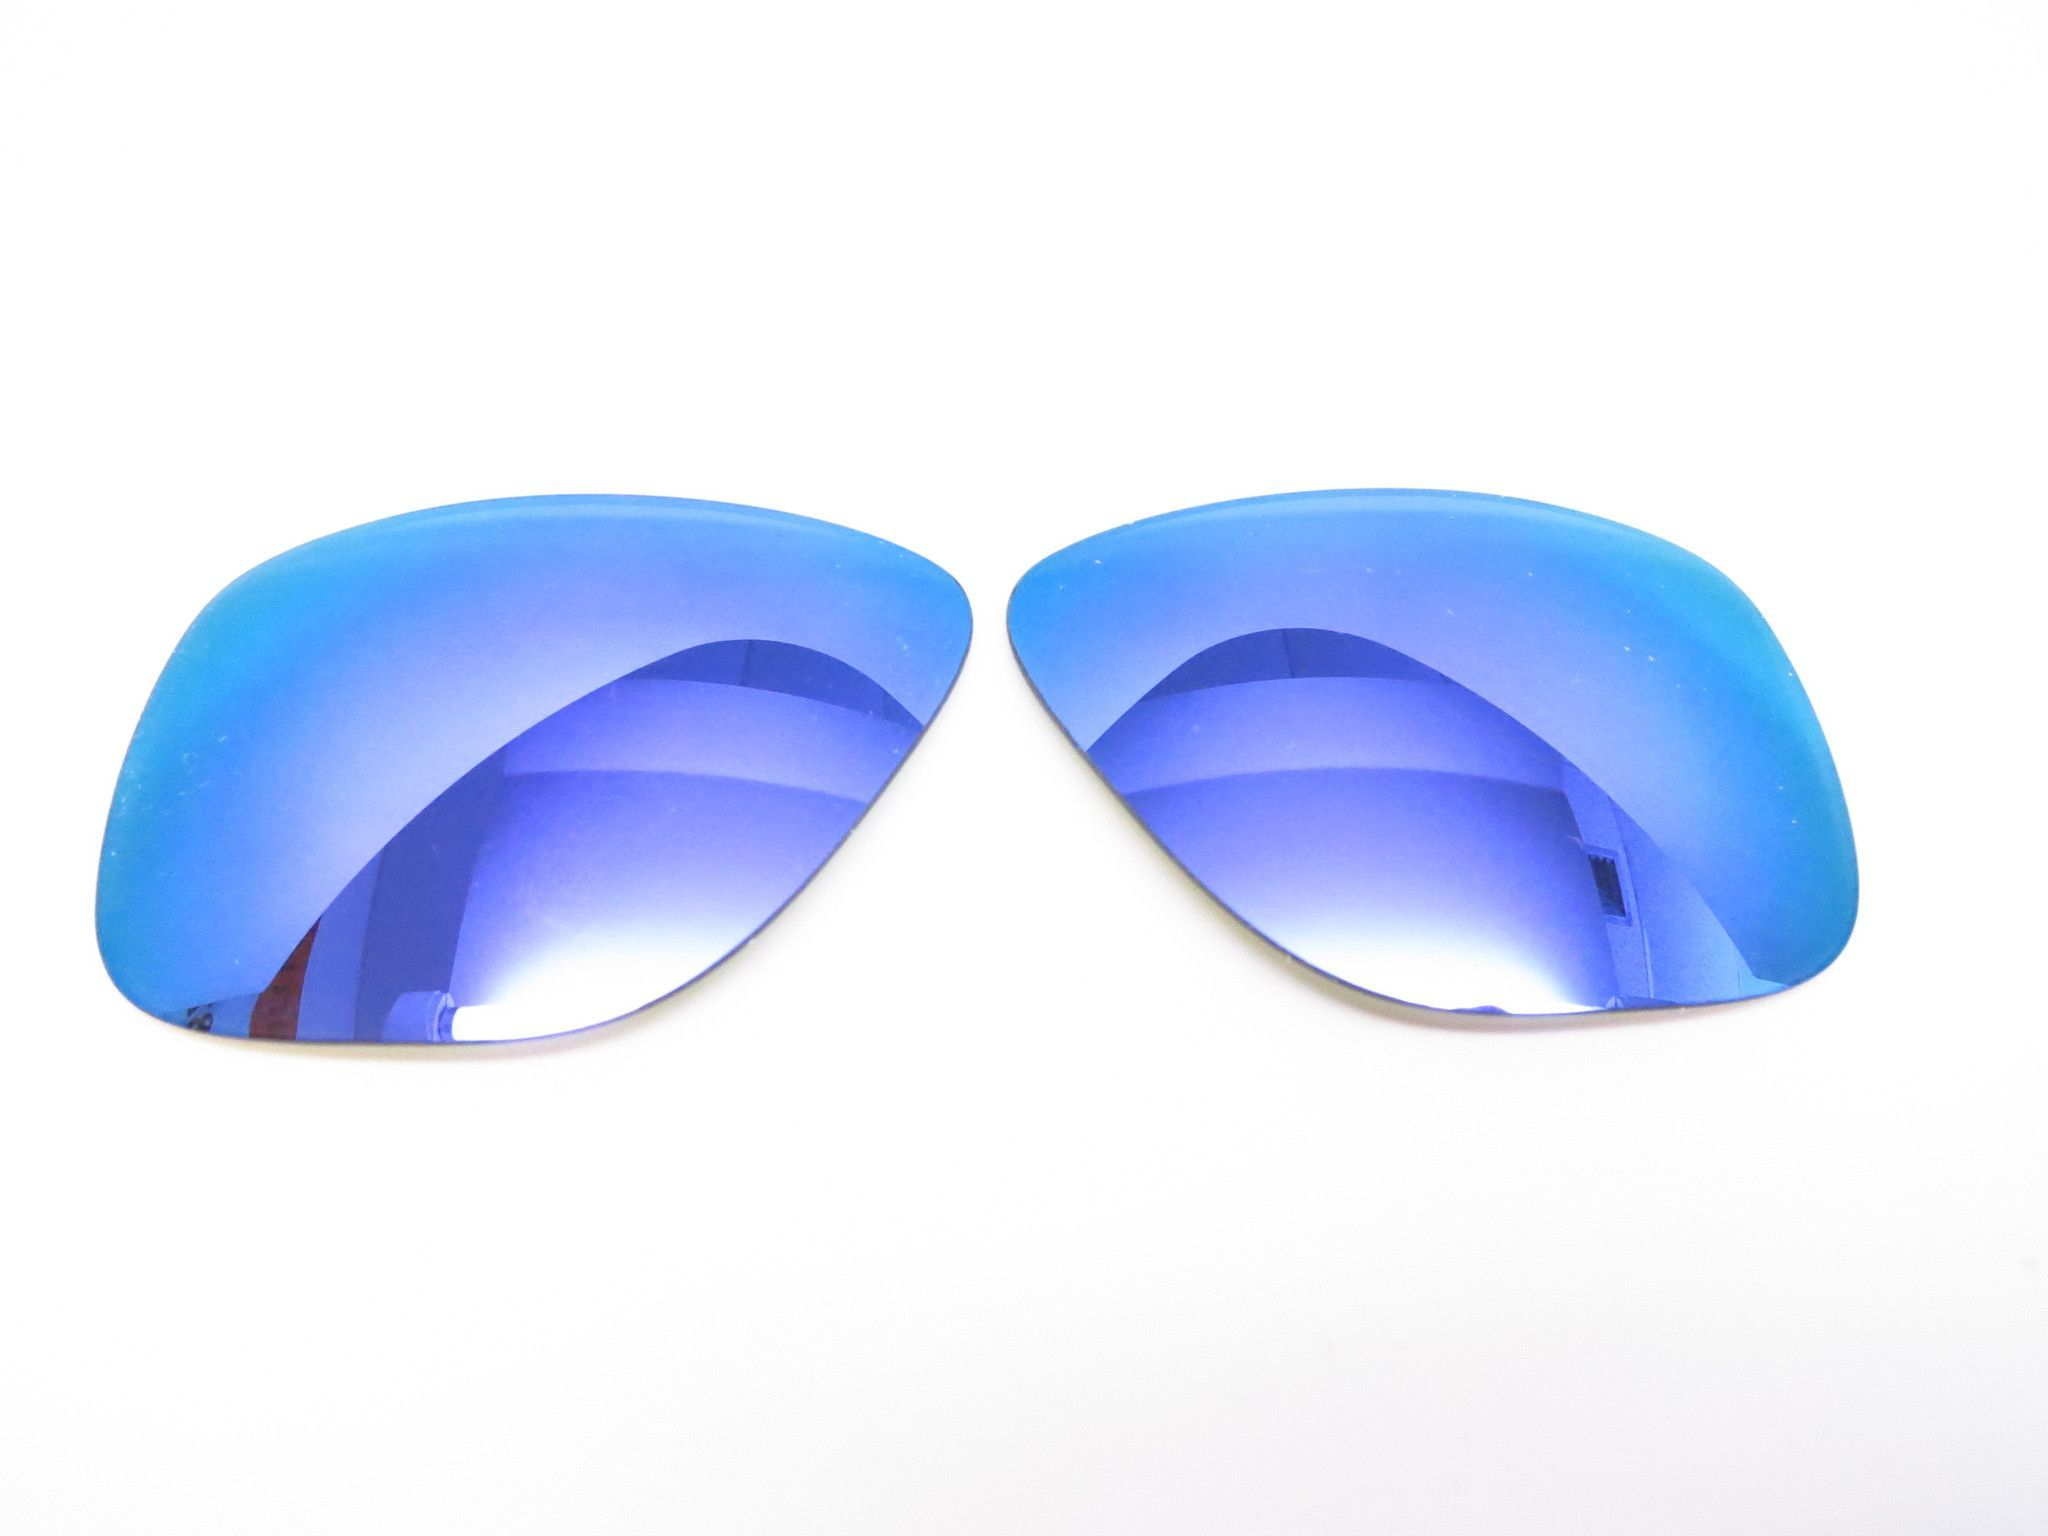 5a32c67004 Oakley Breadbox OO9199 Sunglass Replacement Lenses